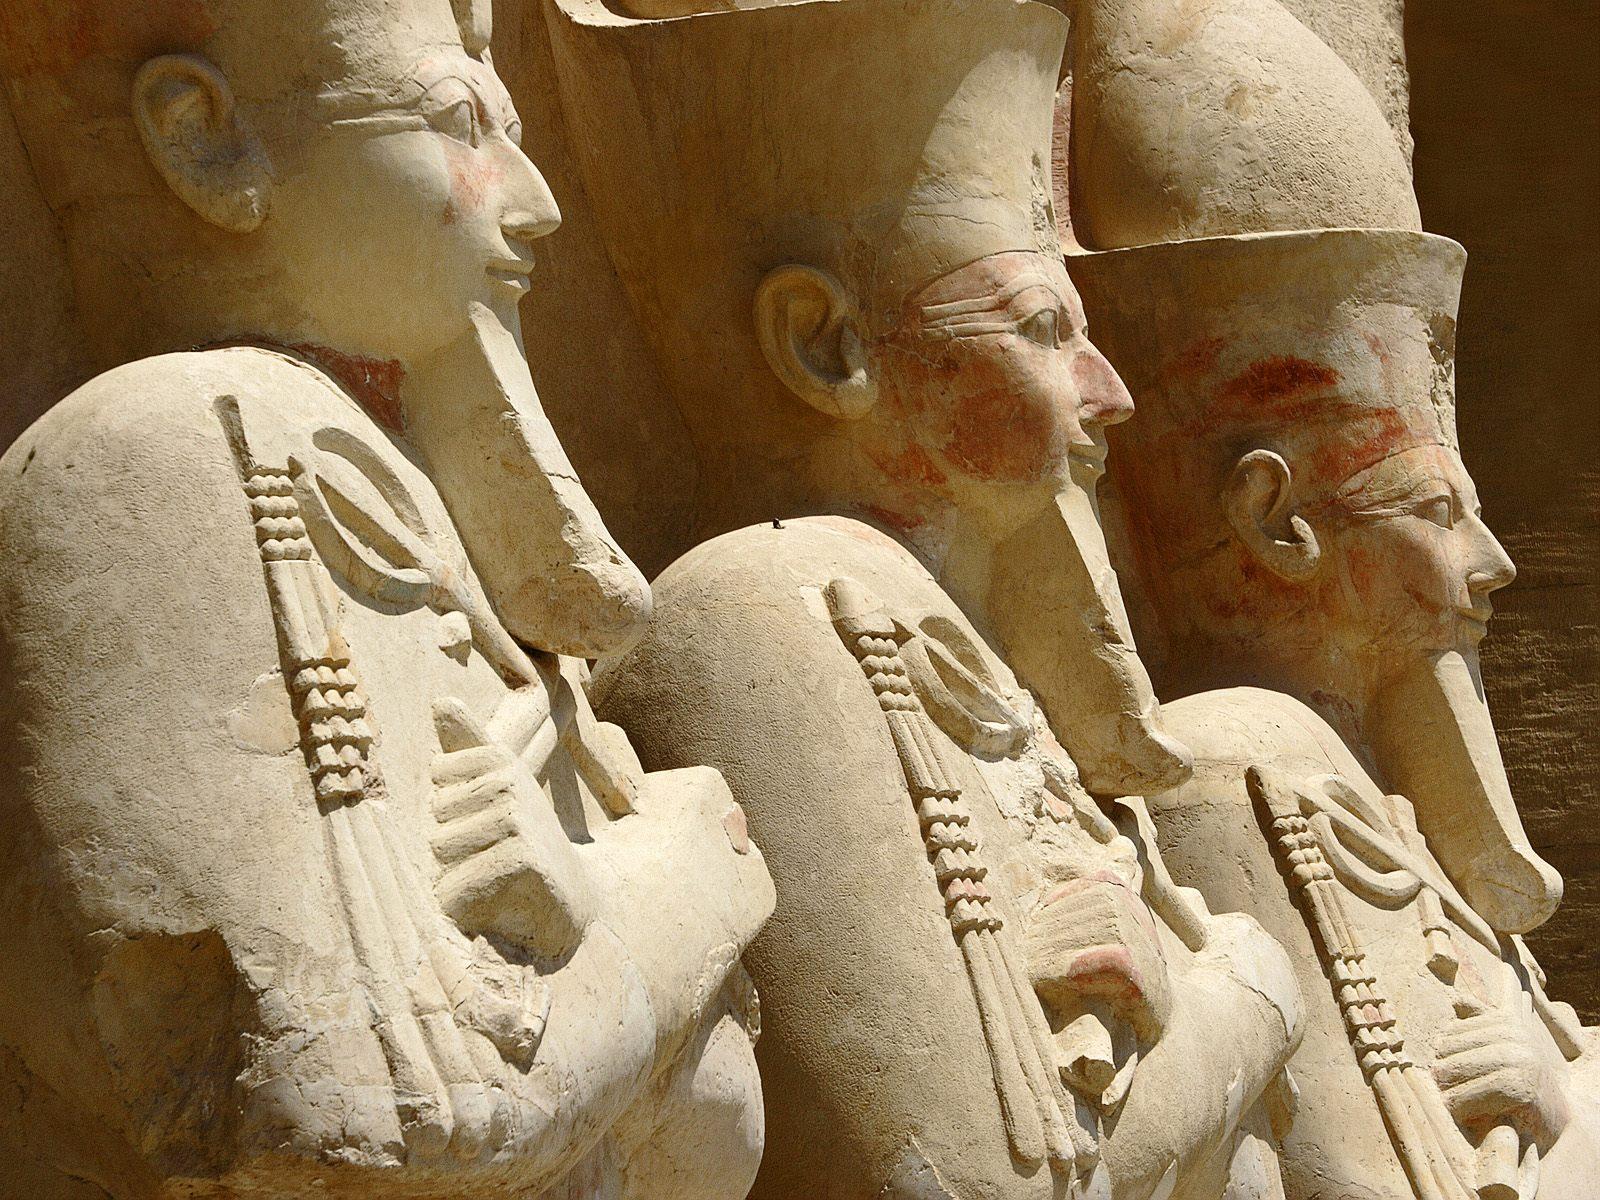 Estátuas no Templo de Hatshepsut Terraço 3 Deir el Bahri Thebes Luxor Egipto